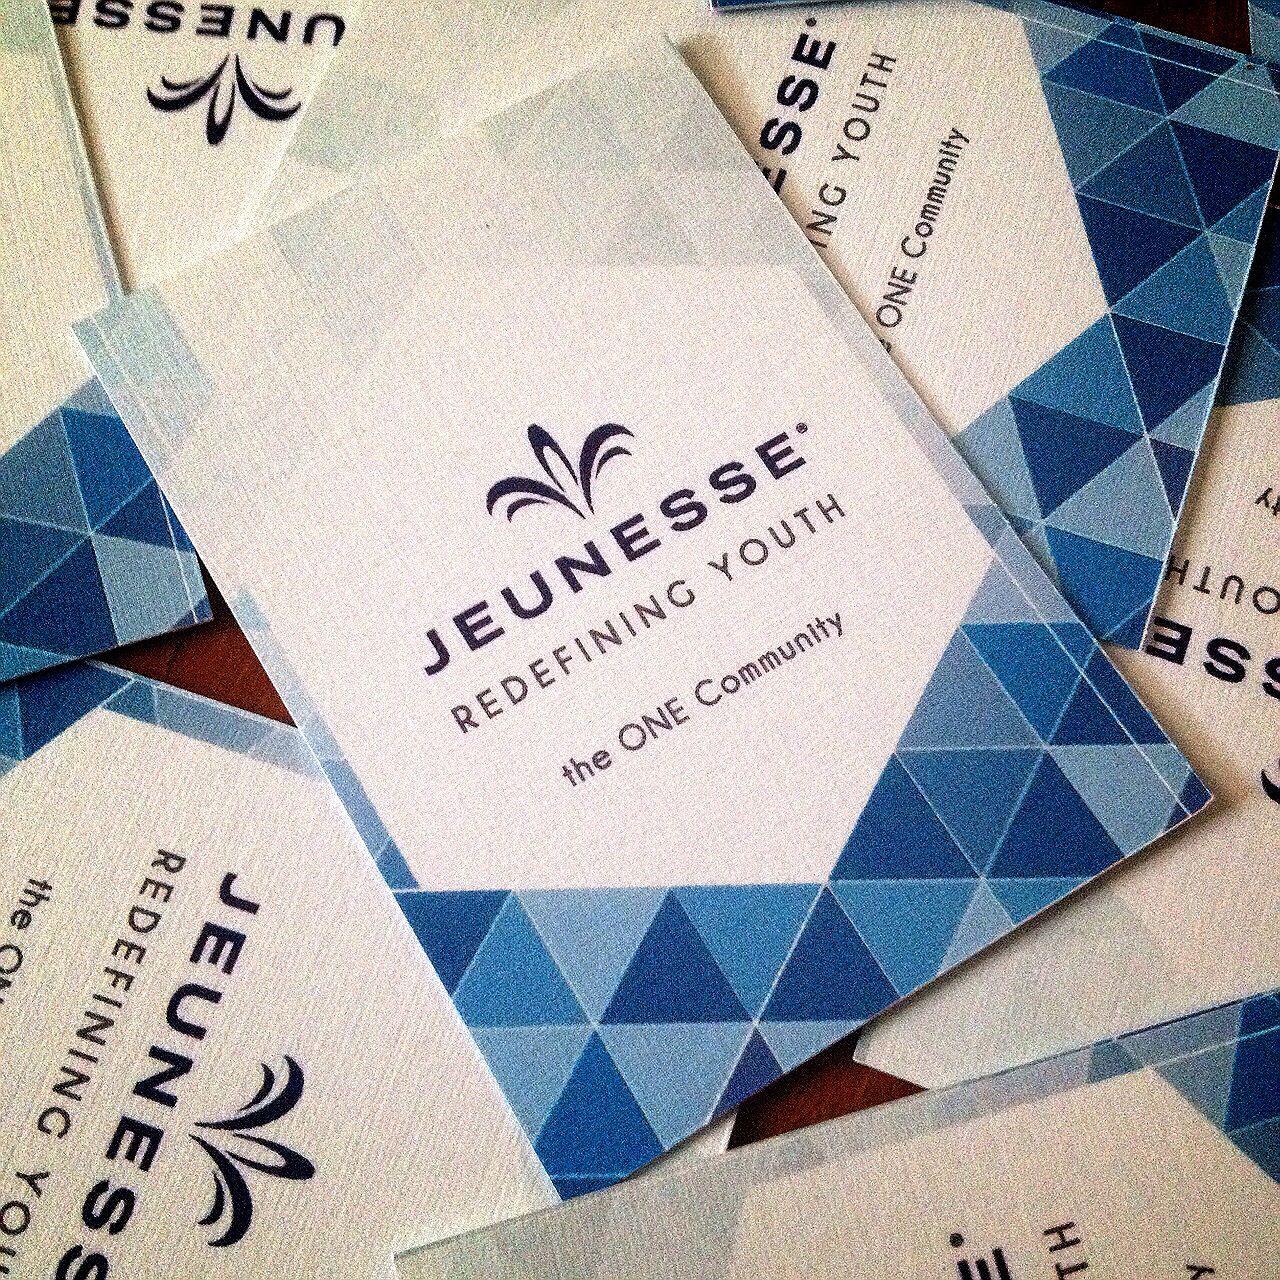 Name Card Design For Jeunesse Client Name Card Design